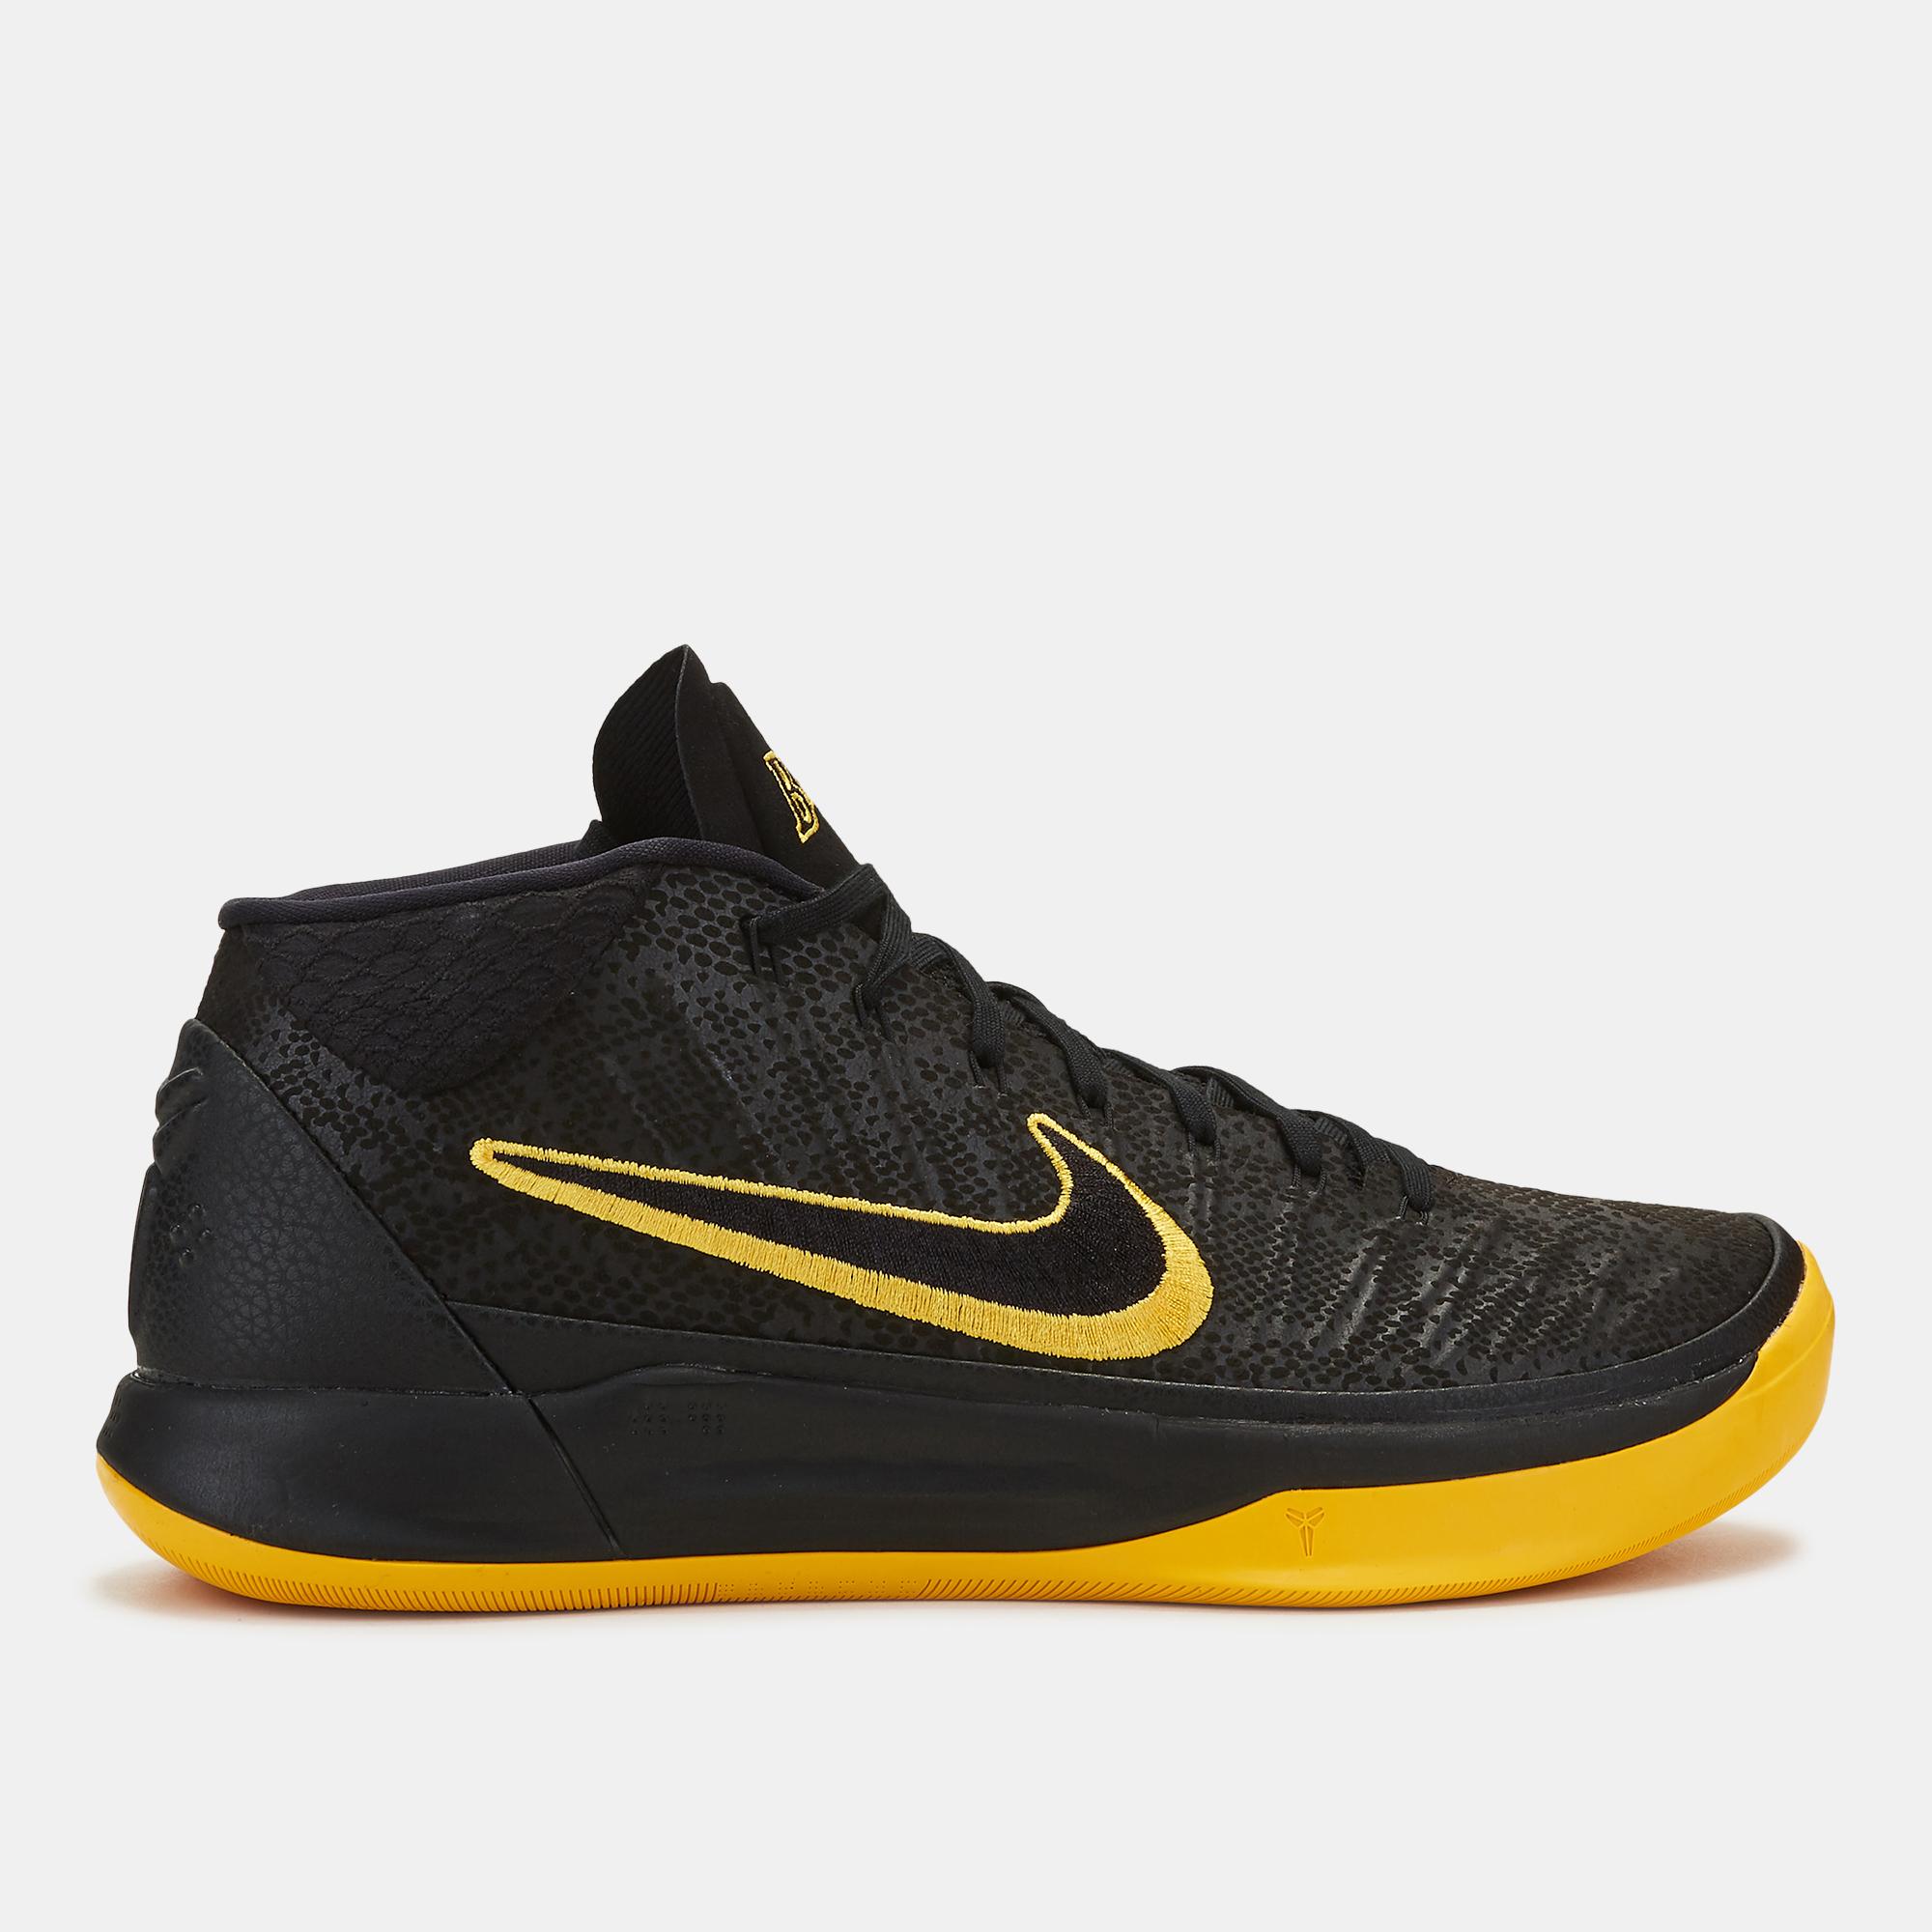 buy popular 06e75 6eb7b Shop Black Nike Kobe AD Black Mamba City Edition Basketball ...